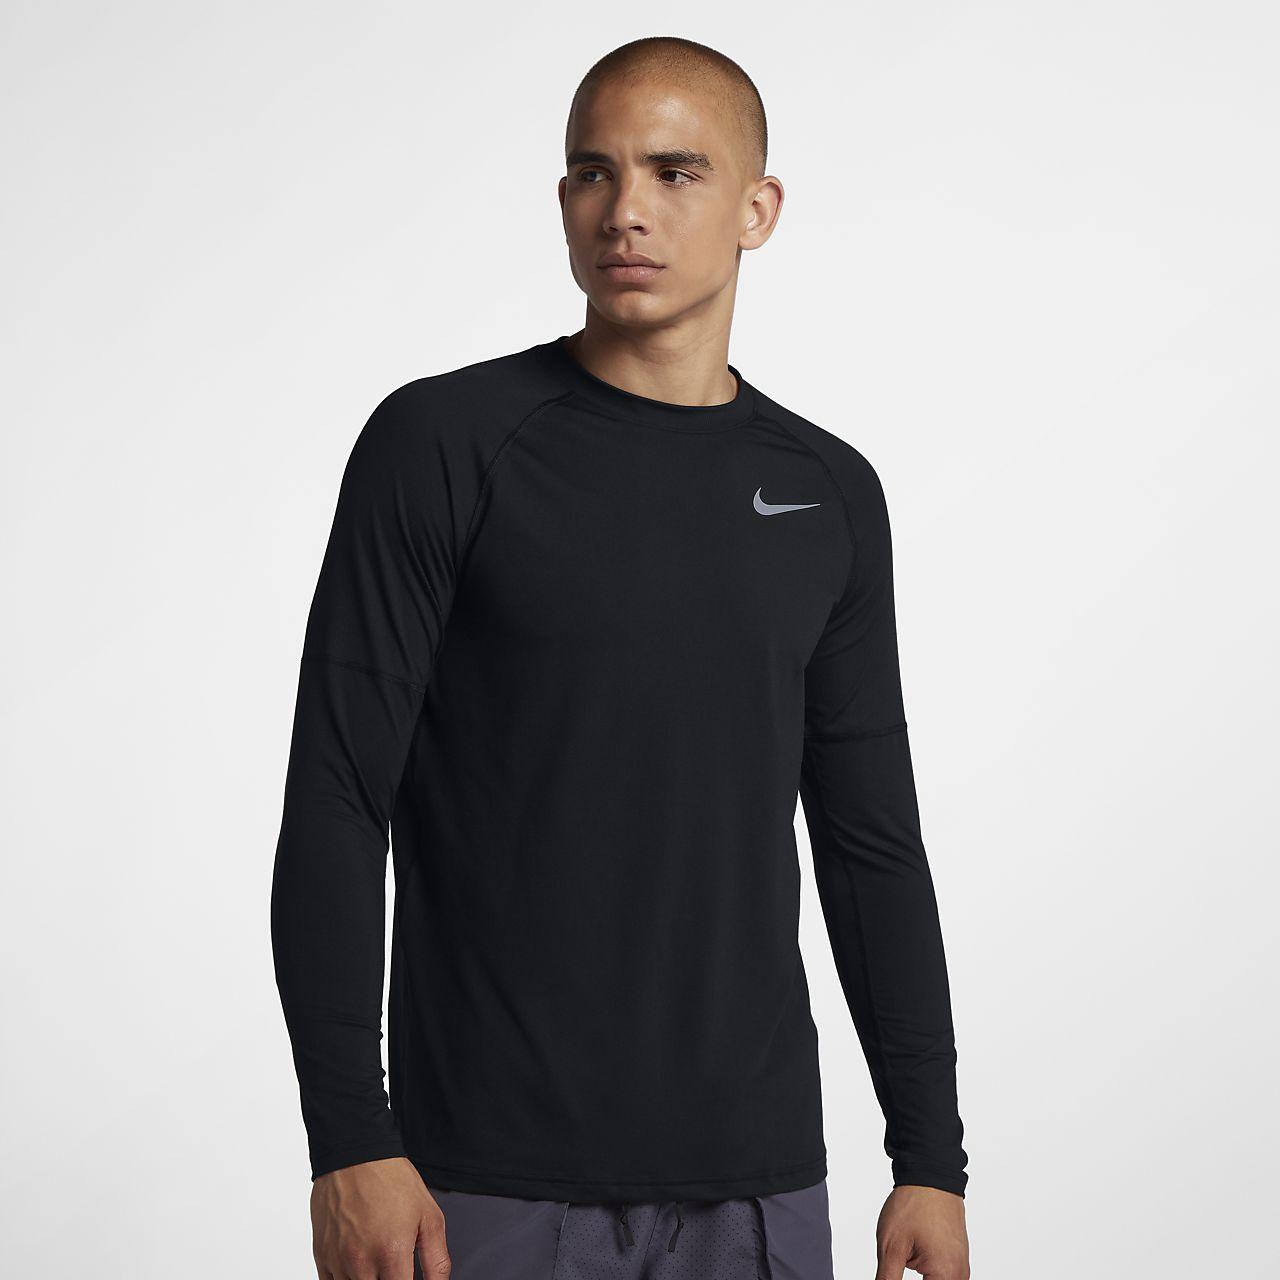 Nike Men's Running Top